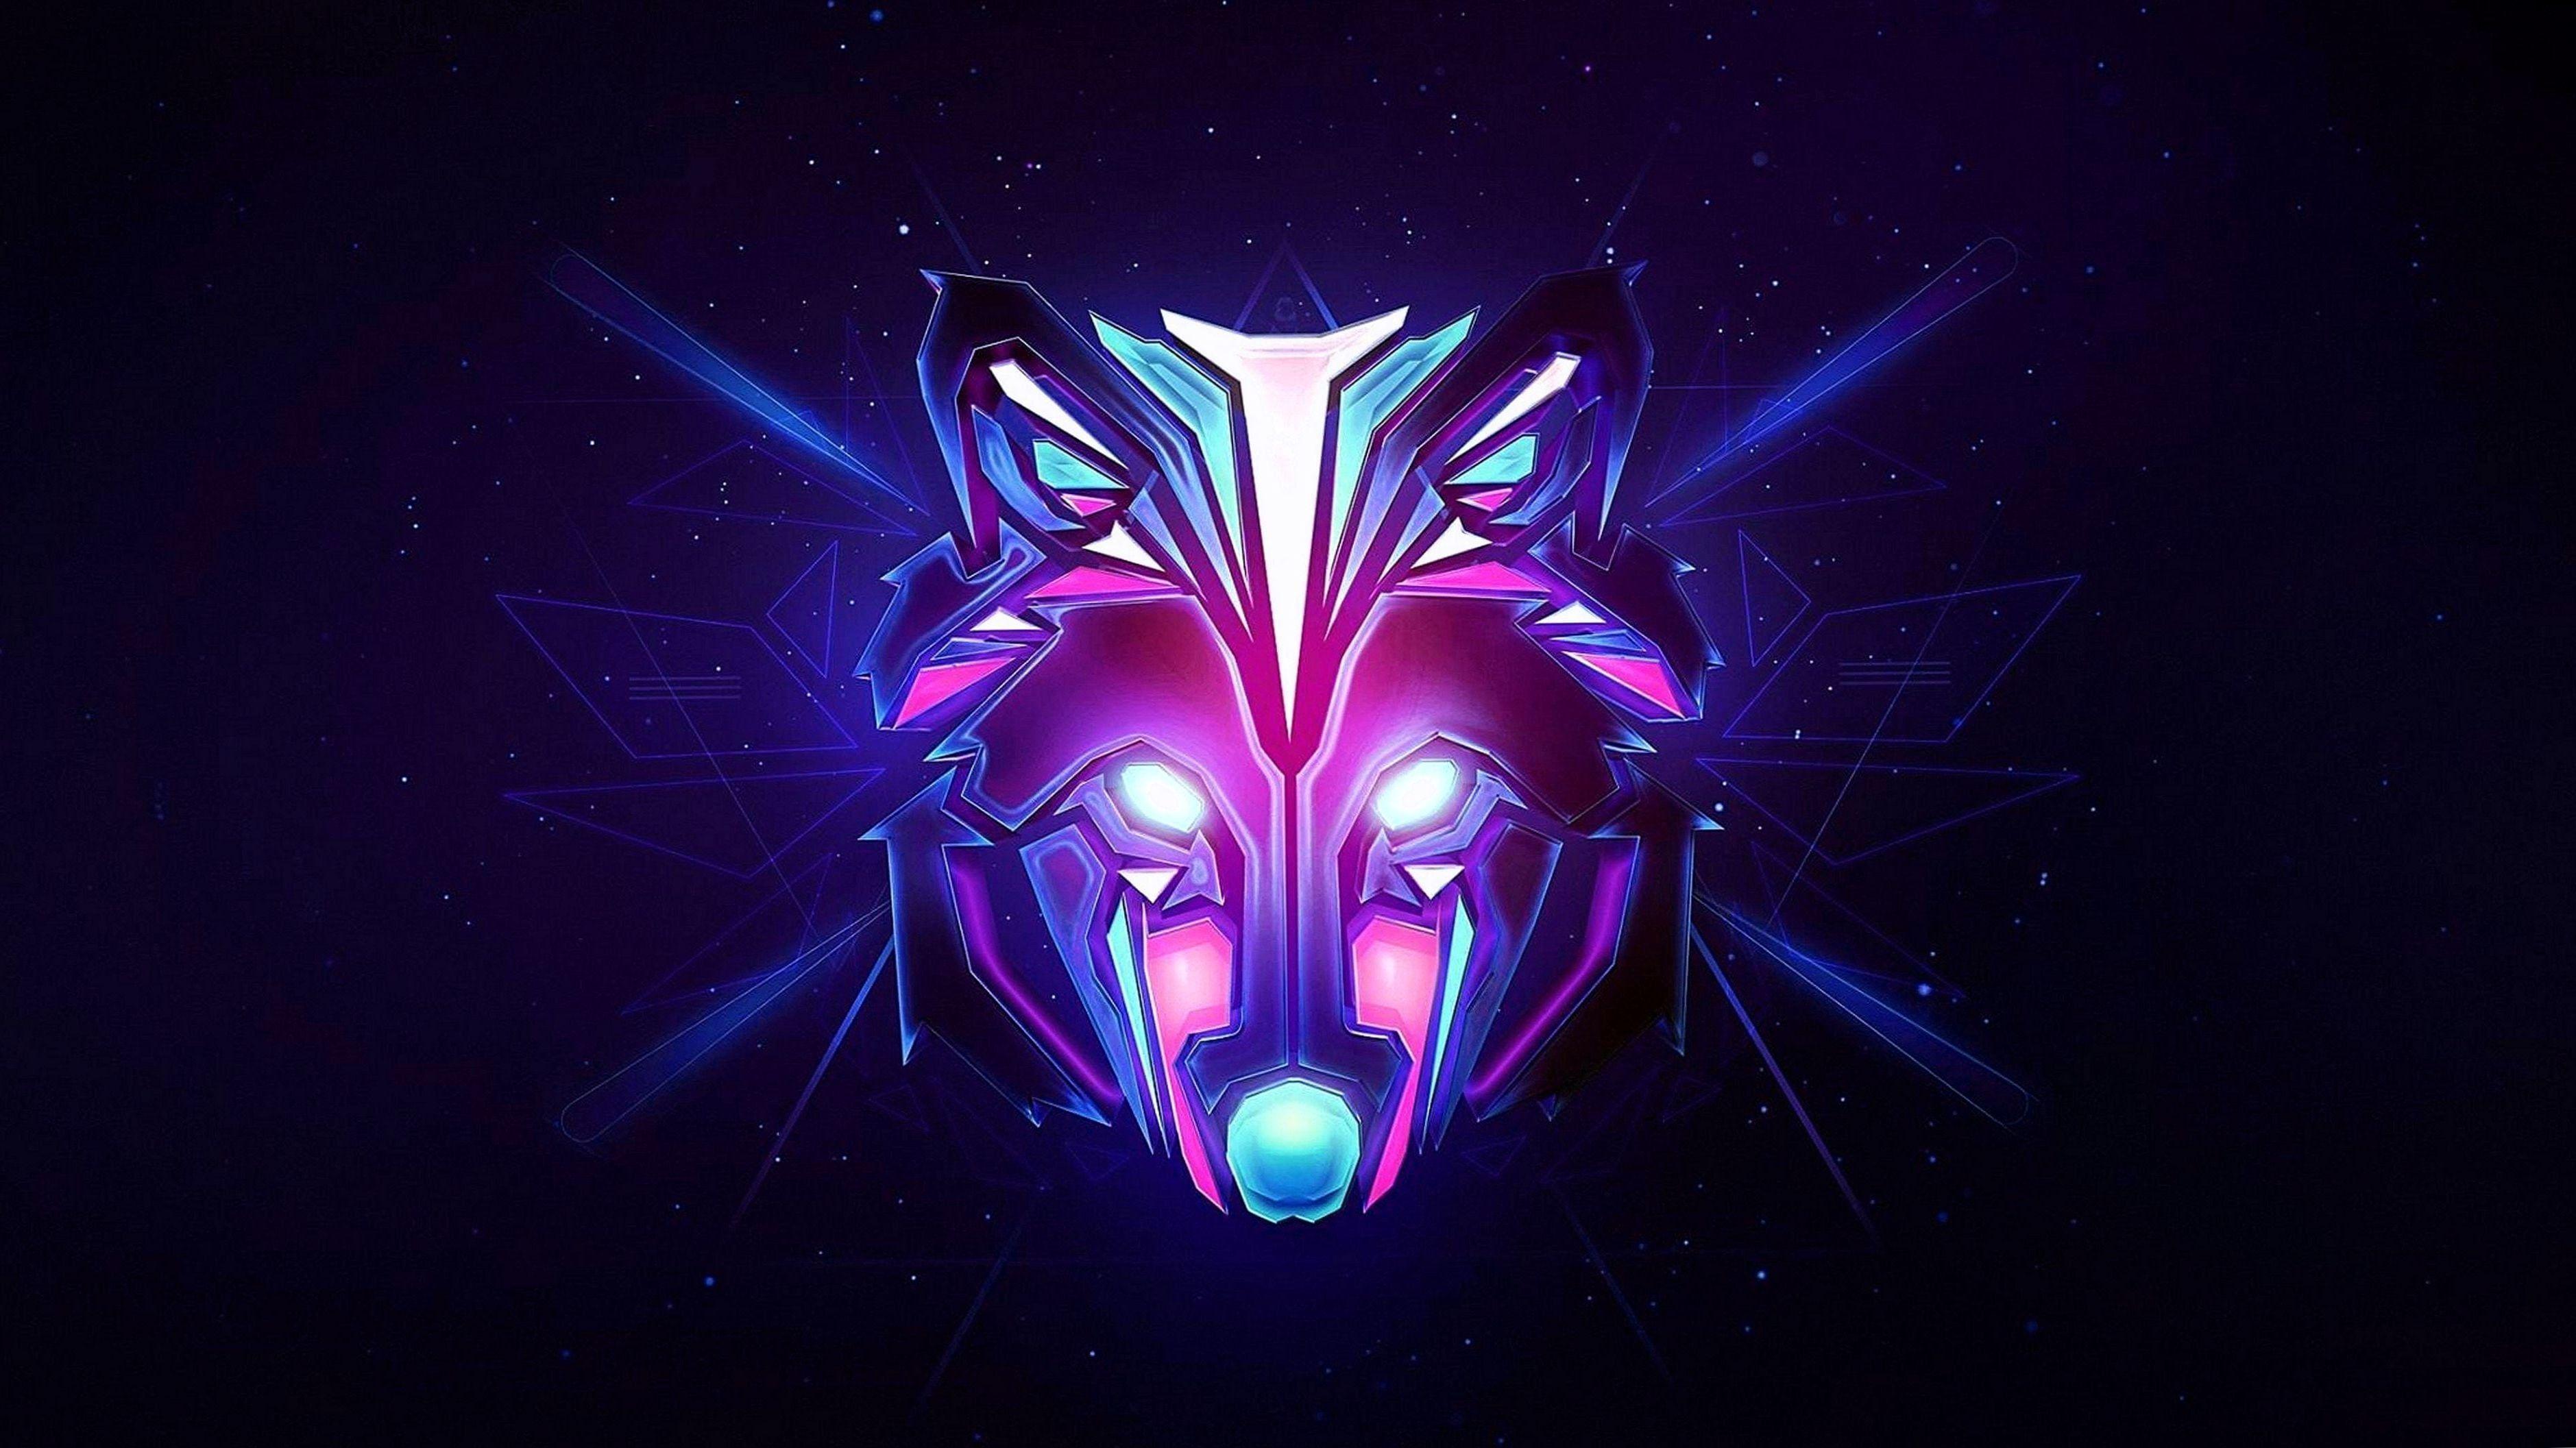 Wolf Gaming Wallpapers | Desain